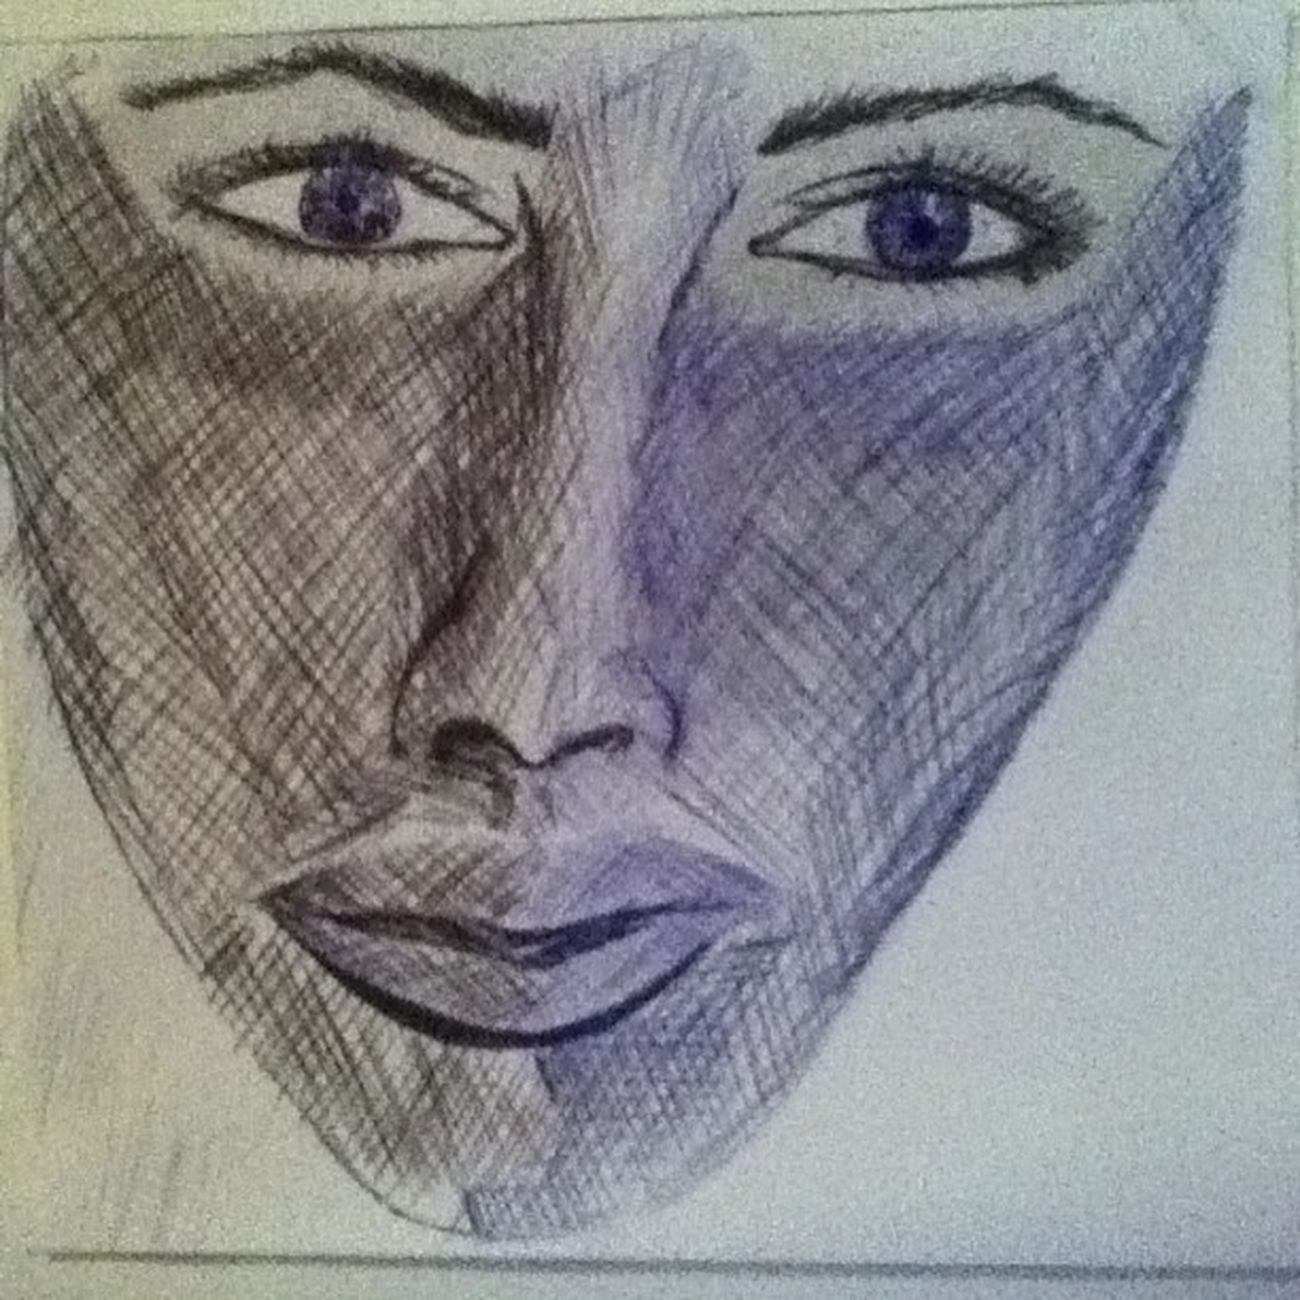 2bleface Eye Nose Blue And Black Brightness Shadow Mouth Ink Pen Eyelash Eyebrows Eyeblue Eyeblack Face Drawing Art Portaretrat Good Follow Fine Like Like4like Instagood instalikeinstafollow